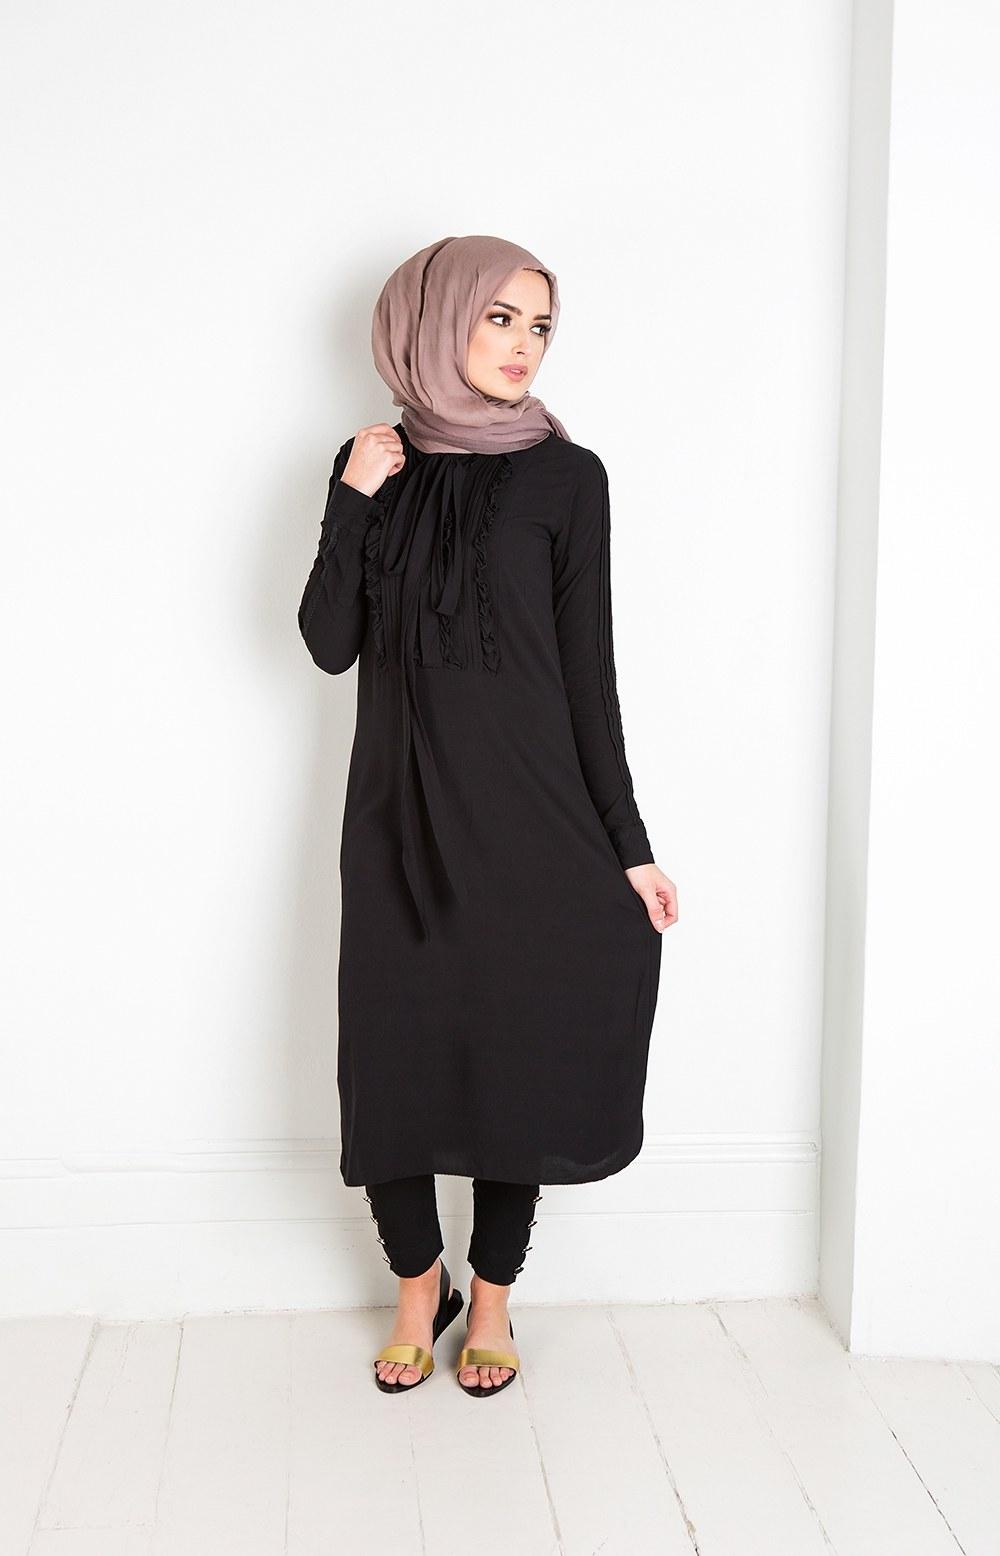 Bentuk Model Baju Lebaran Muslim Terbaru J7do 25 Trend Model Baju Muslim Lebaran 2018 Simple & Modis